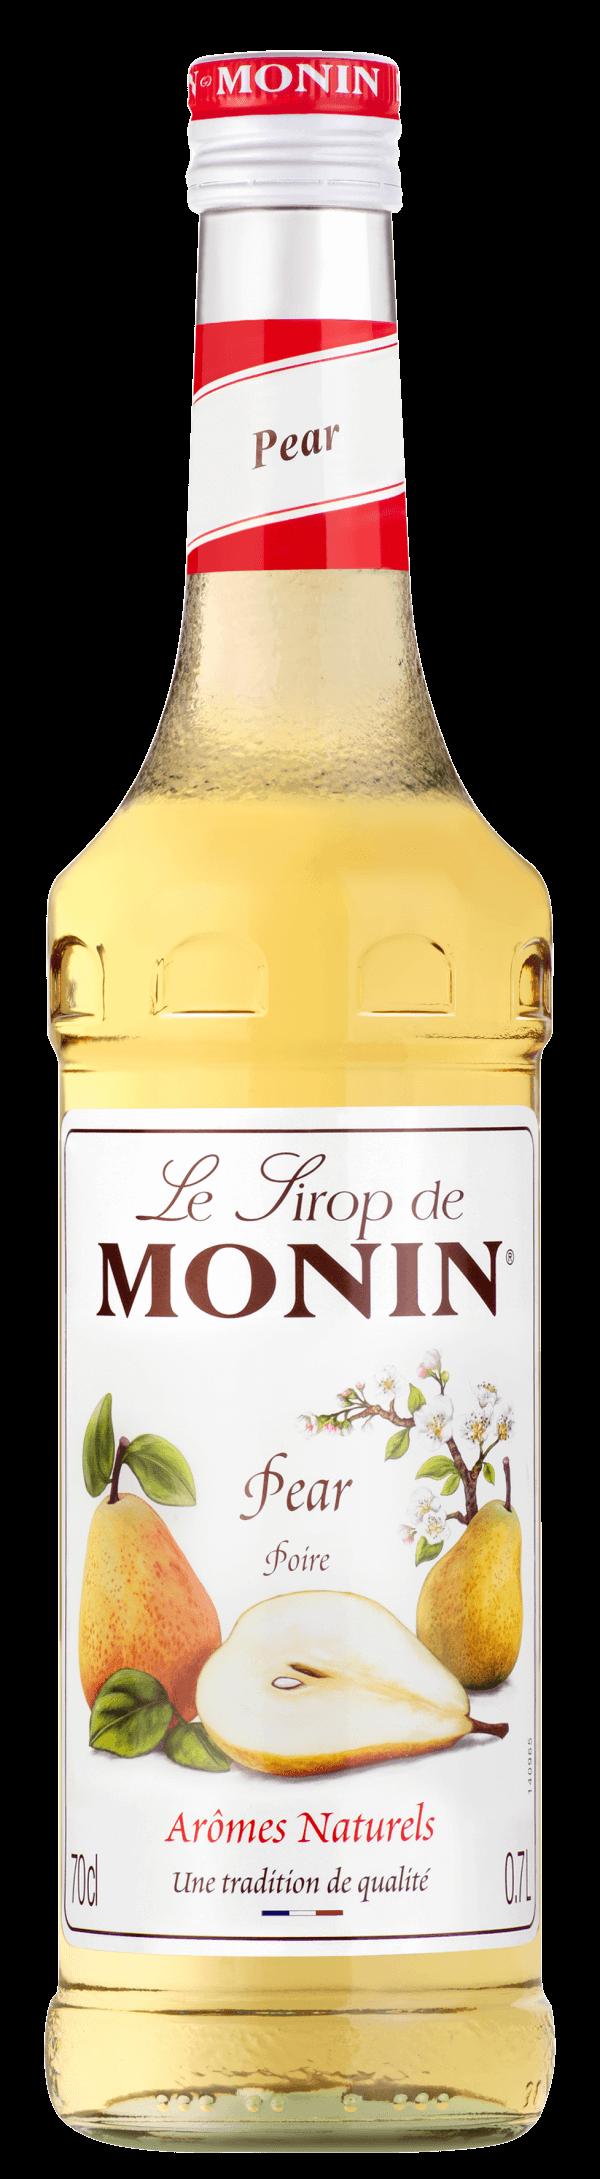 Monin_pear